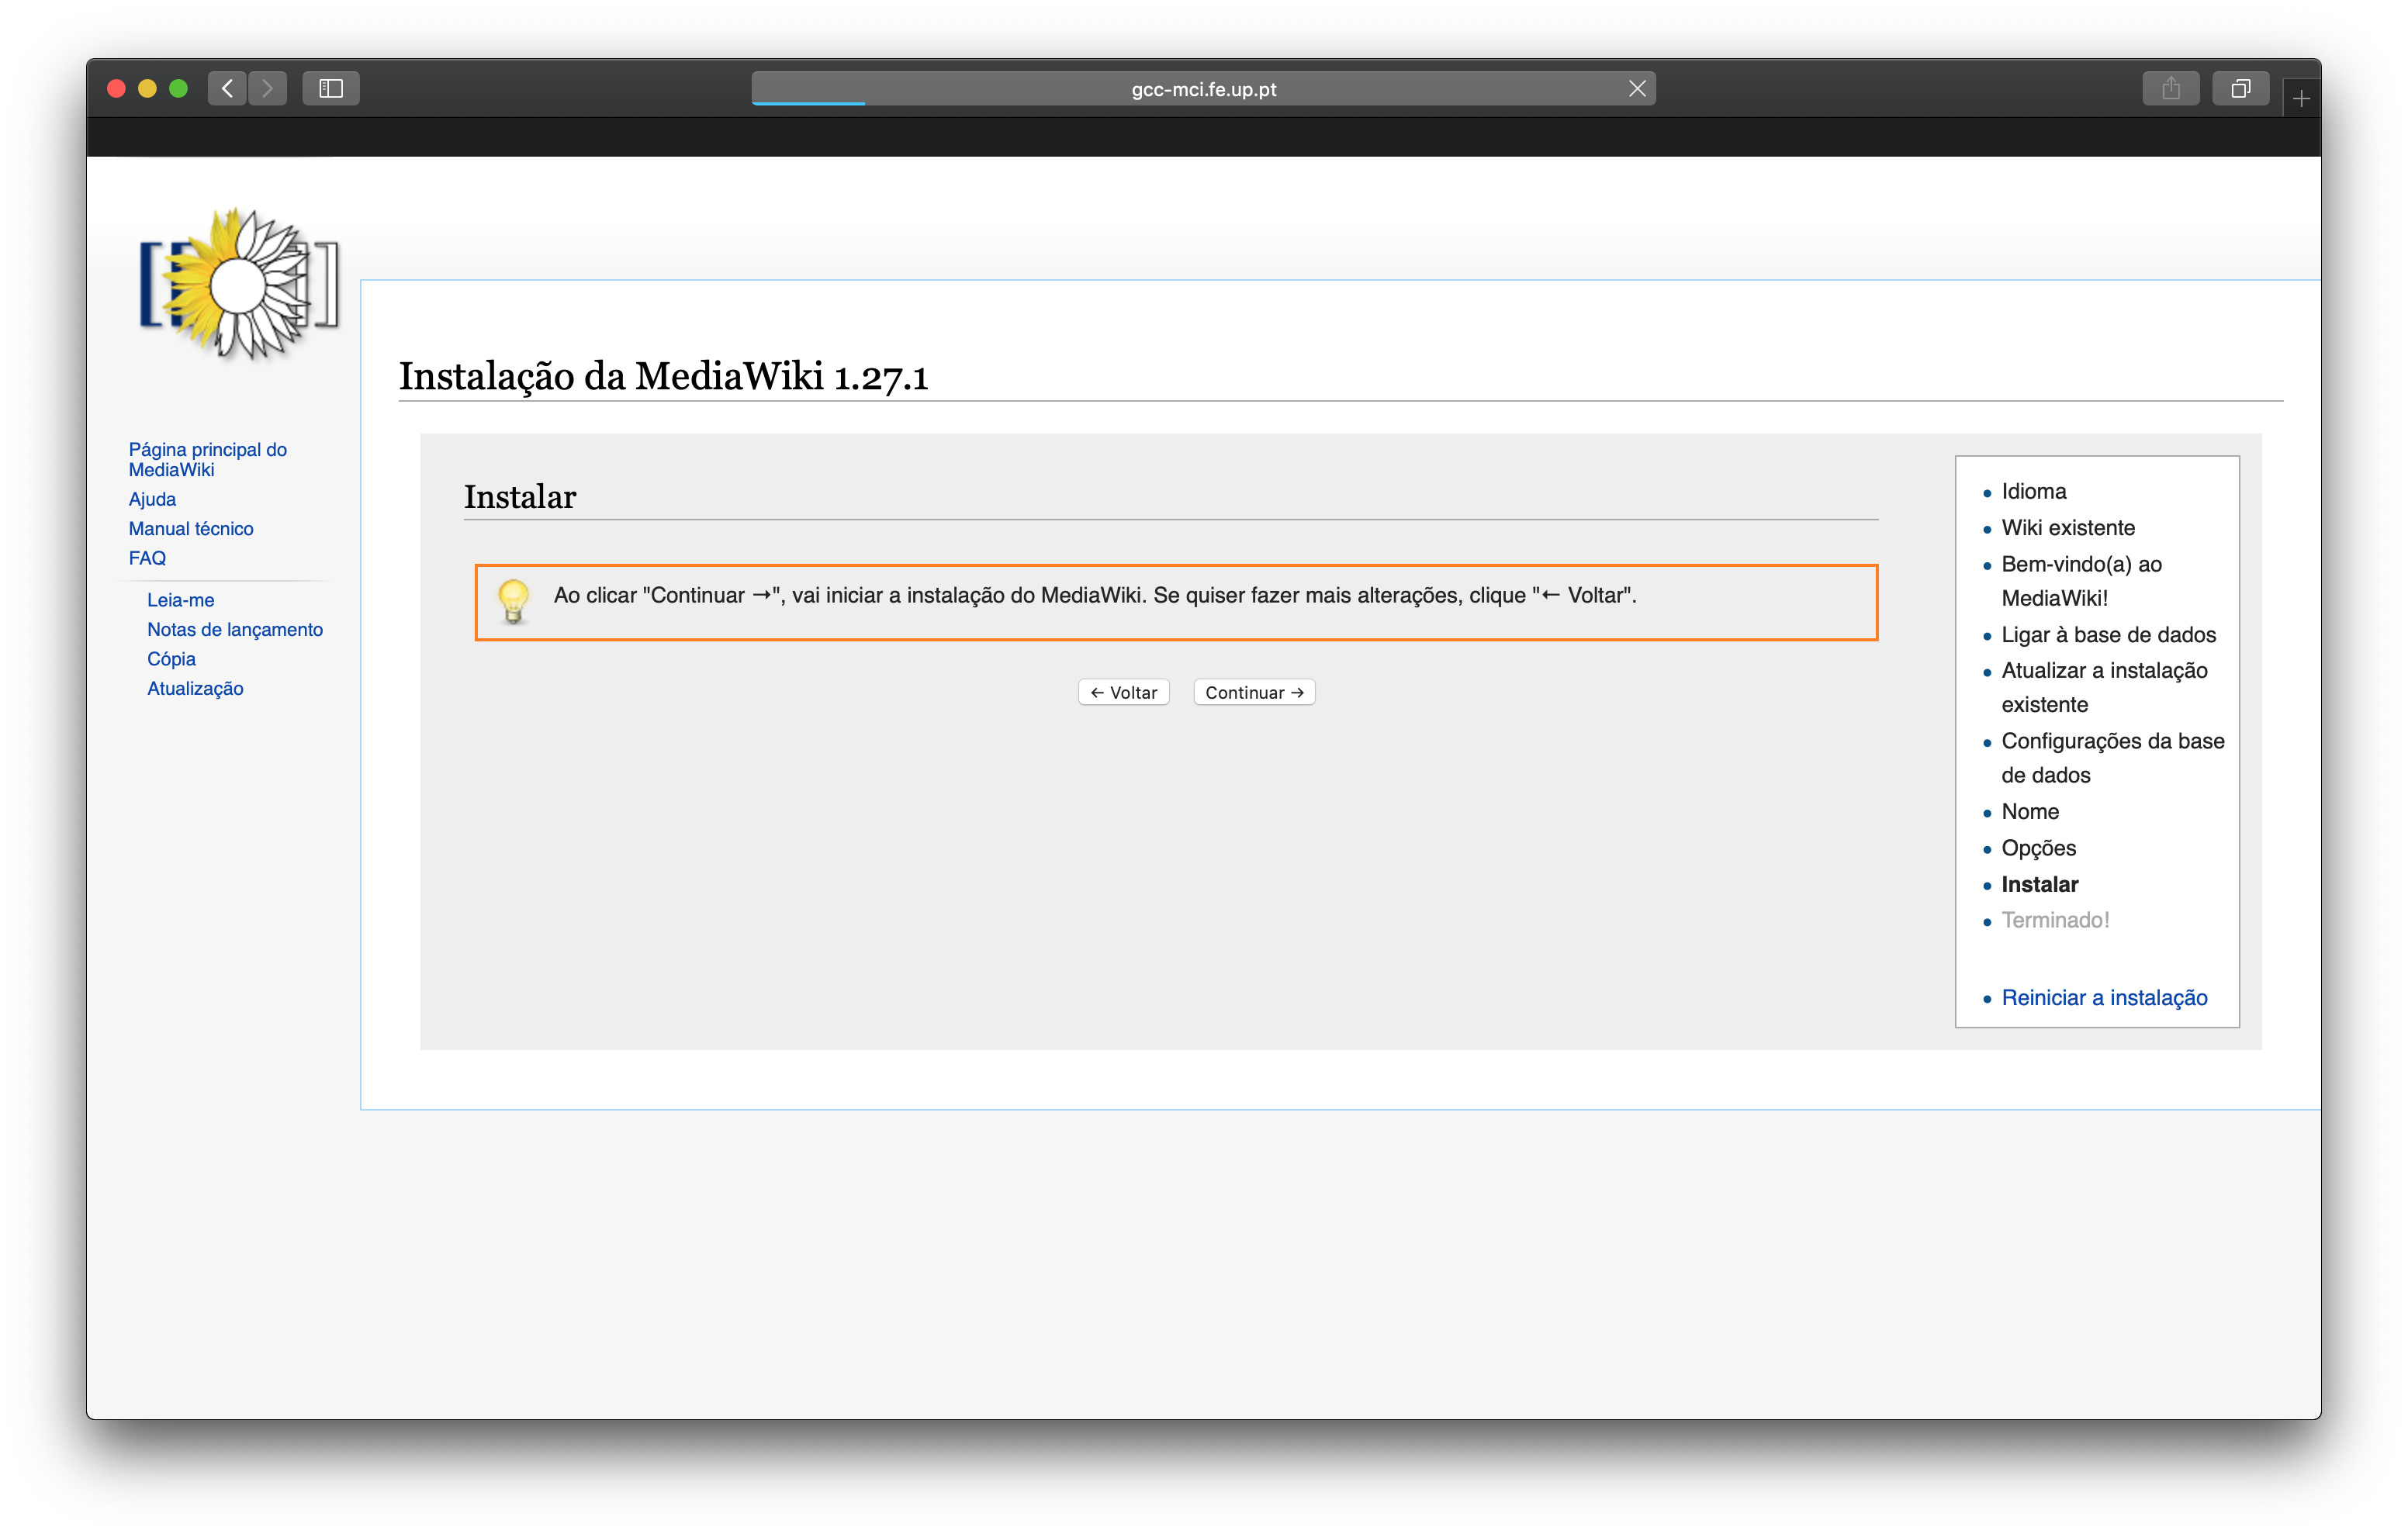 Mediawiki Setup Ready to Install